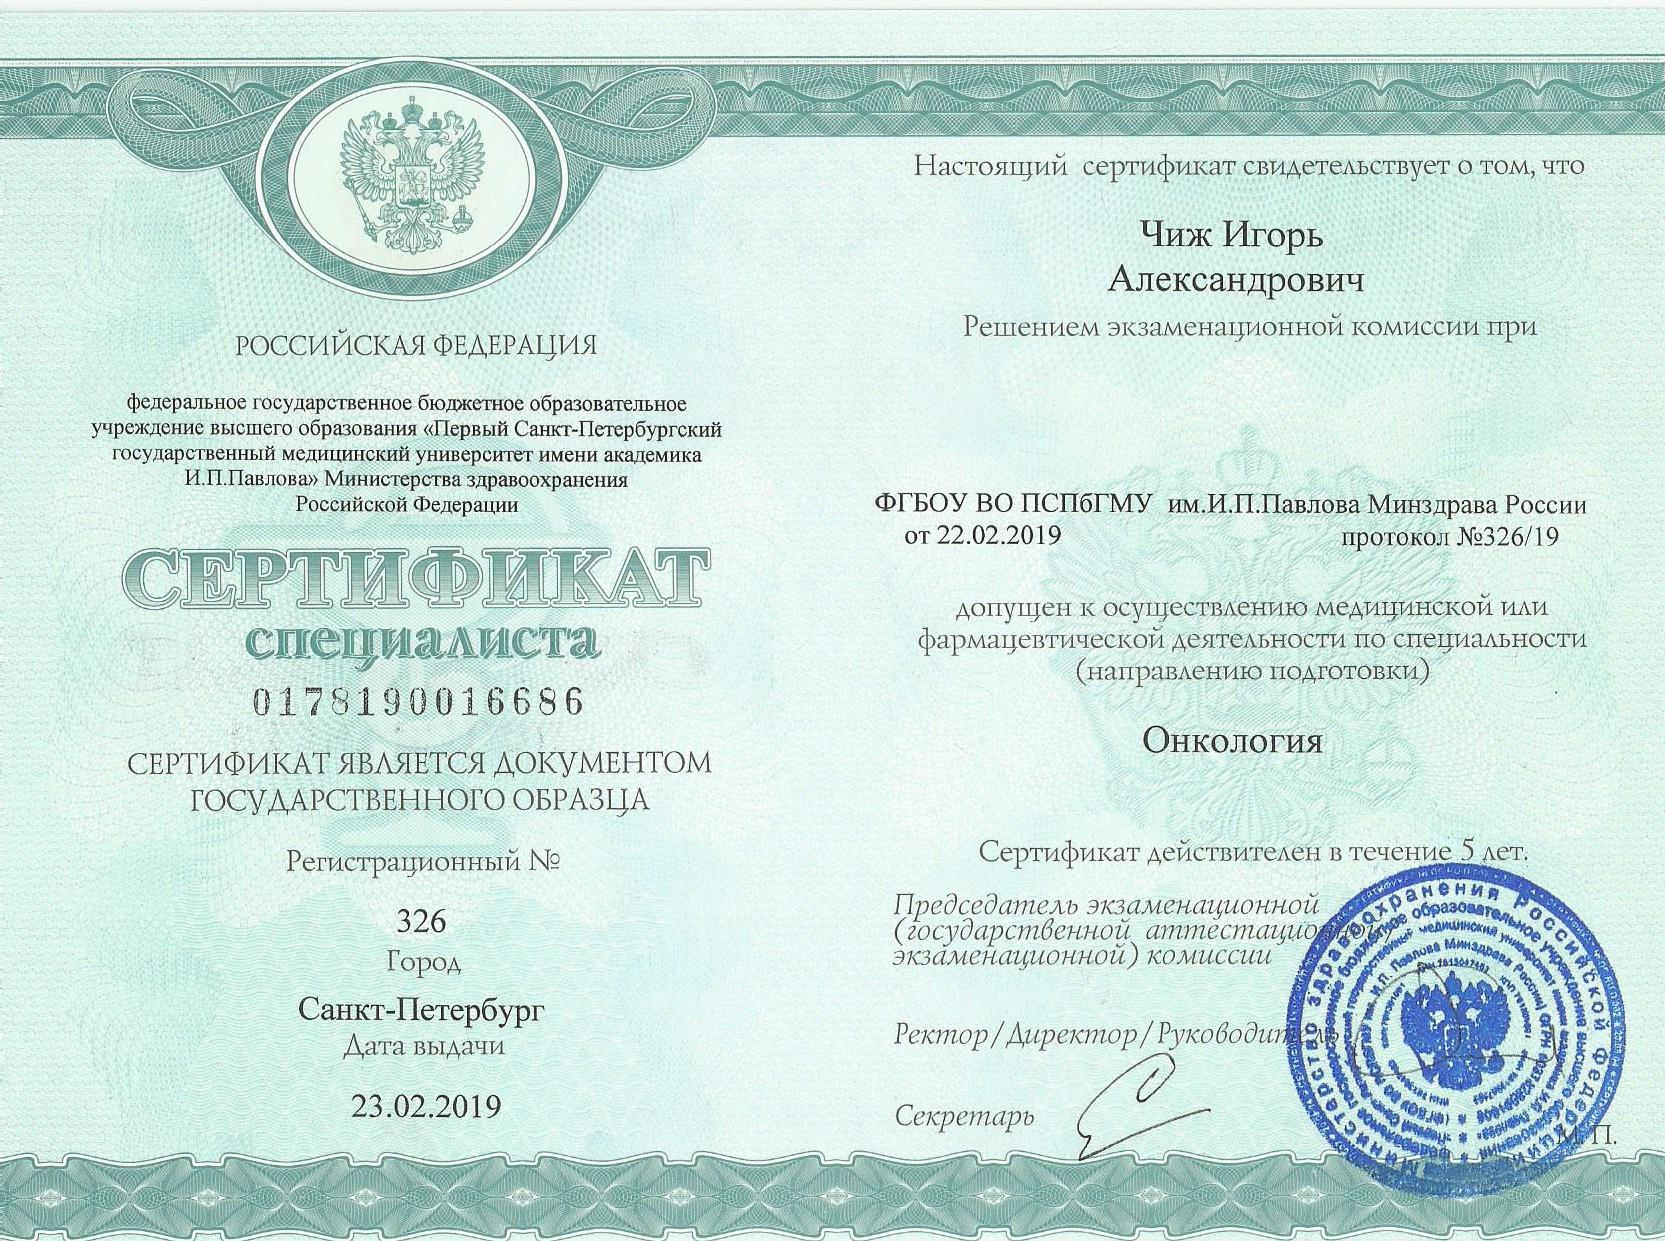 Сертификат онкология Чиж И.А.